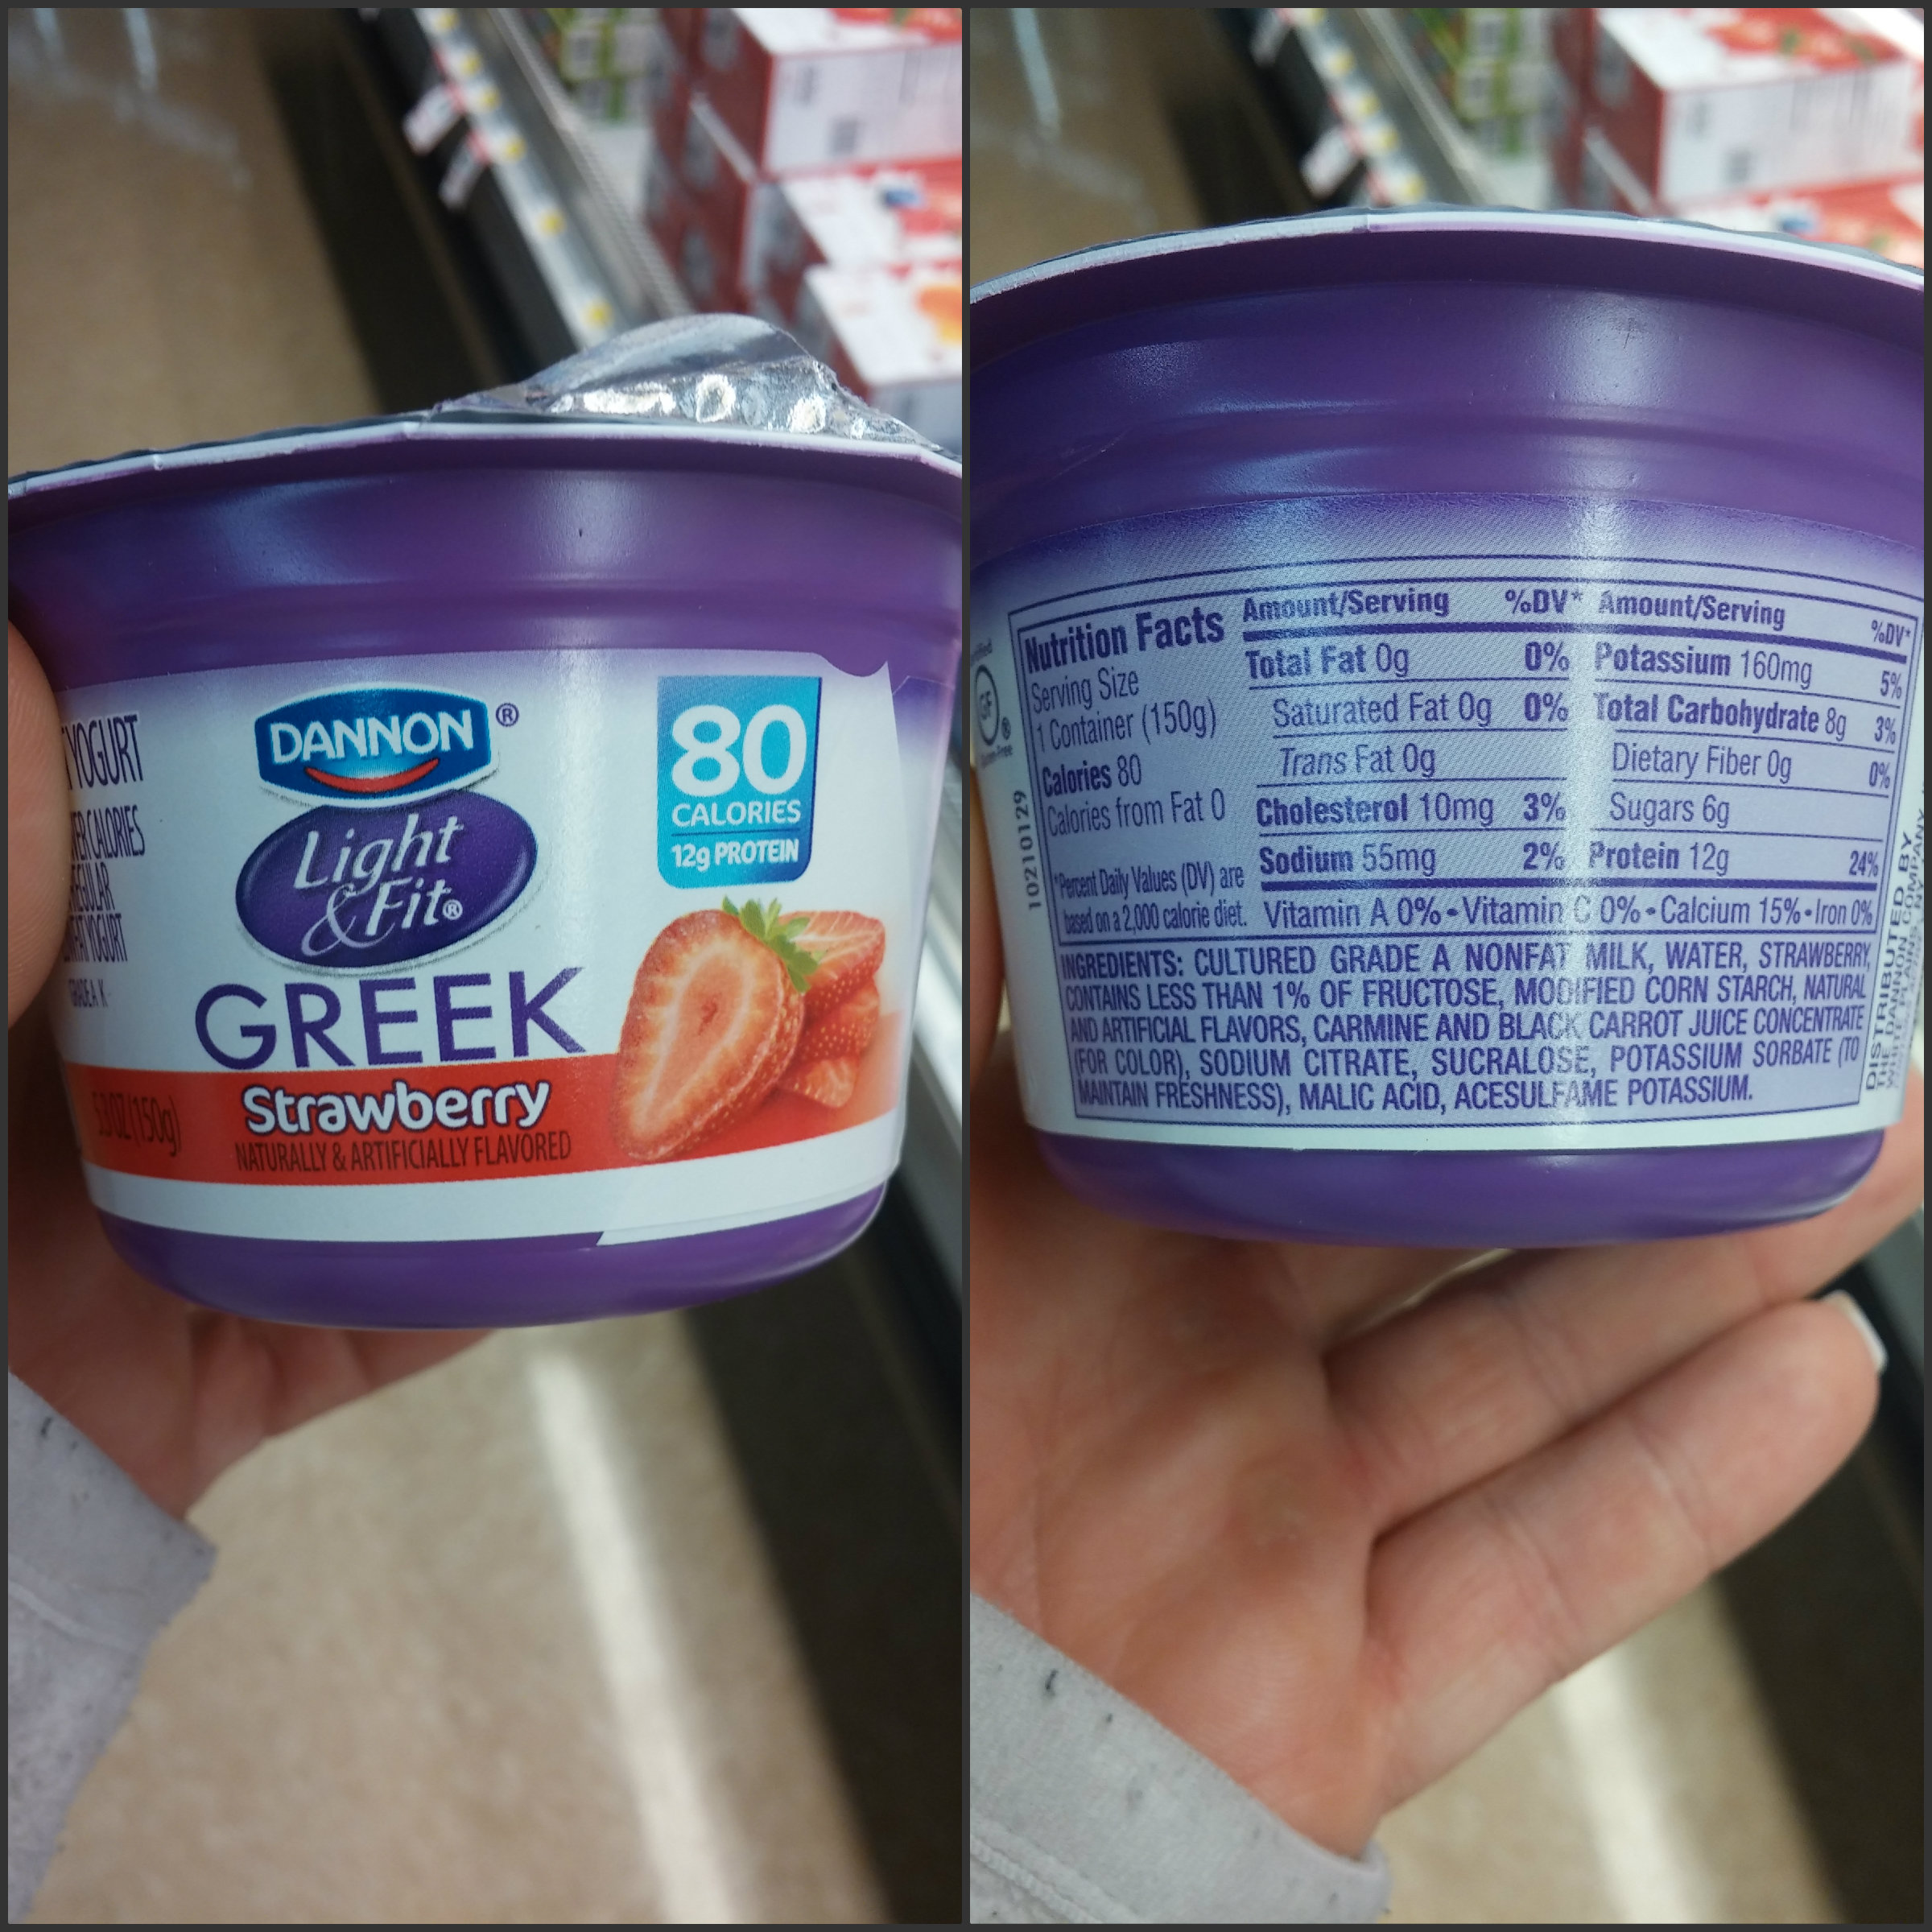 Dannon Light U0026 Fit Greek Strawberry